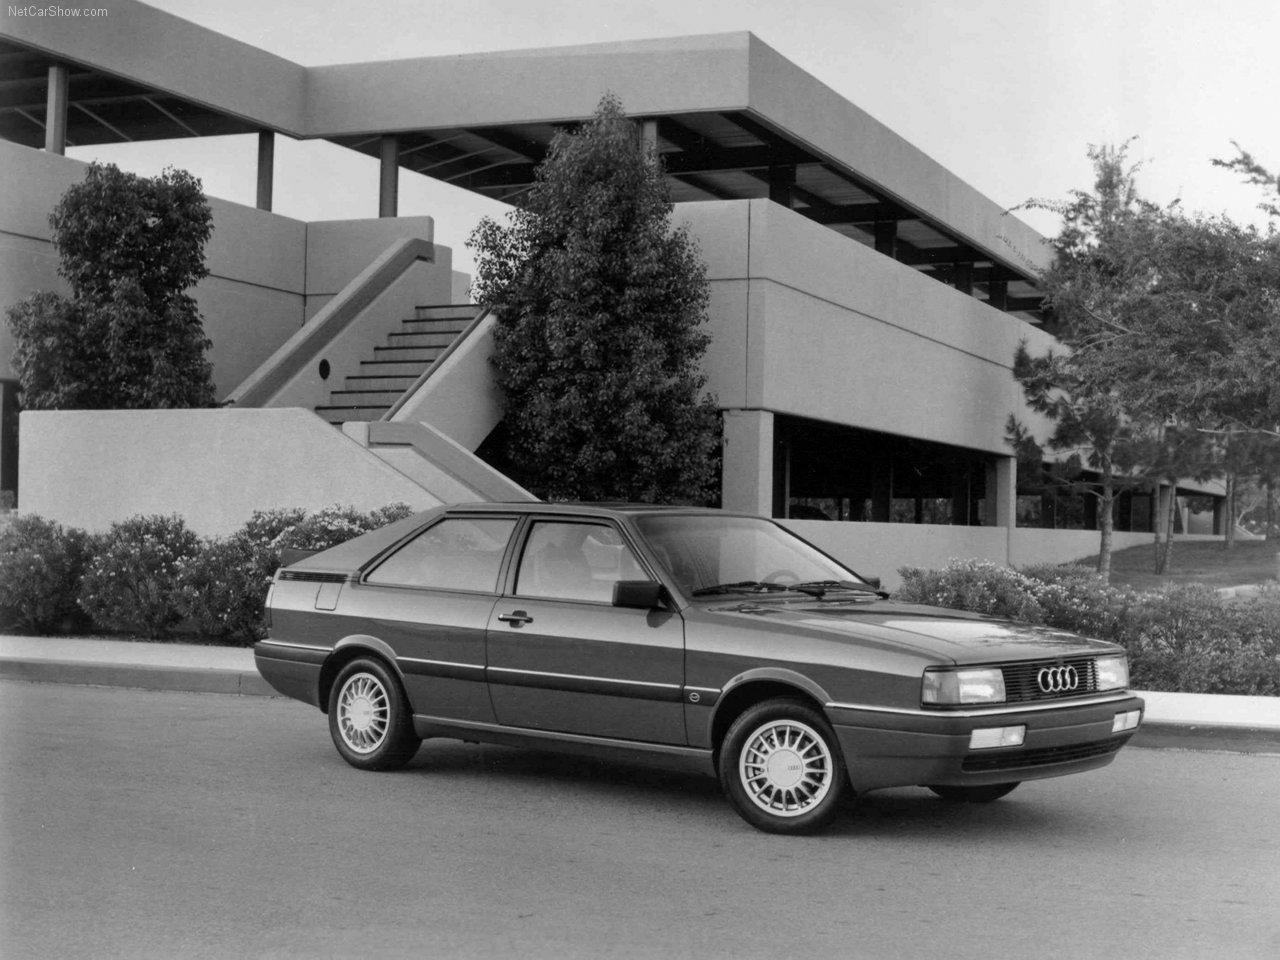 Audi Coupe GT 1985 Audi-Coupe_GT-1985-1280-01